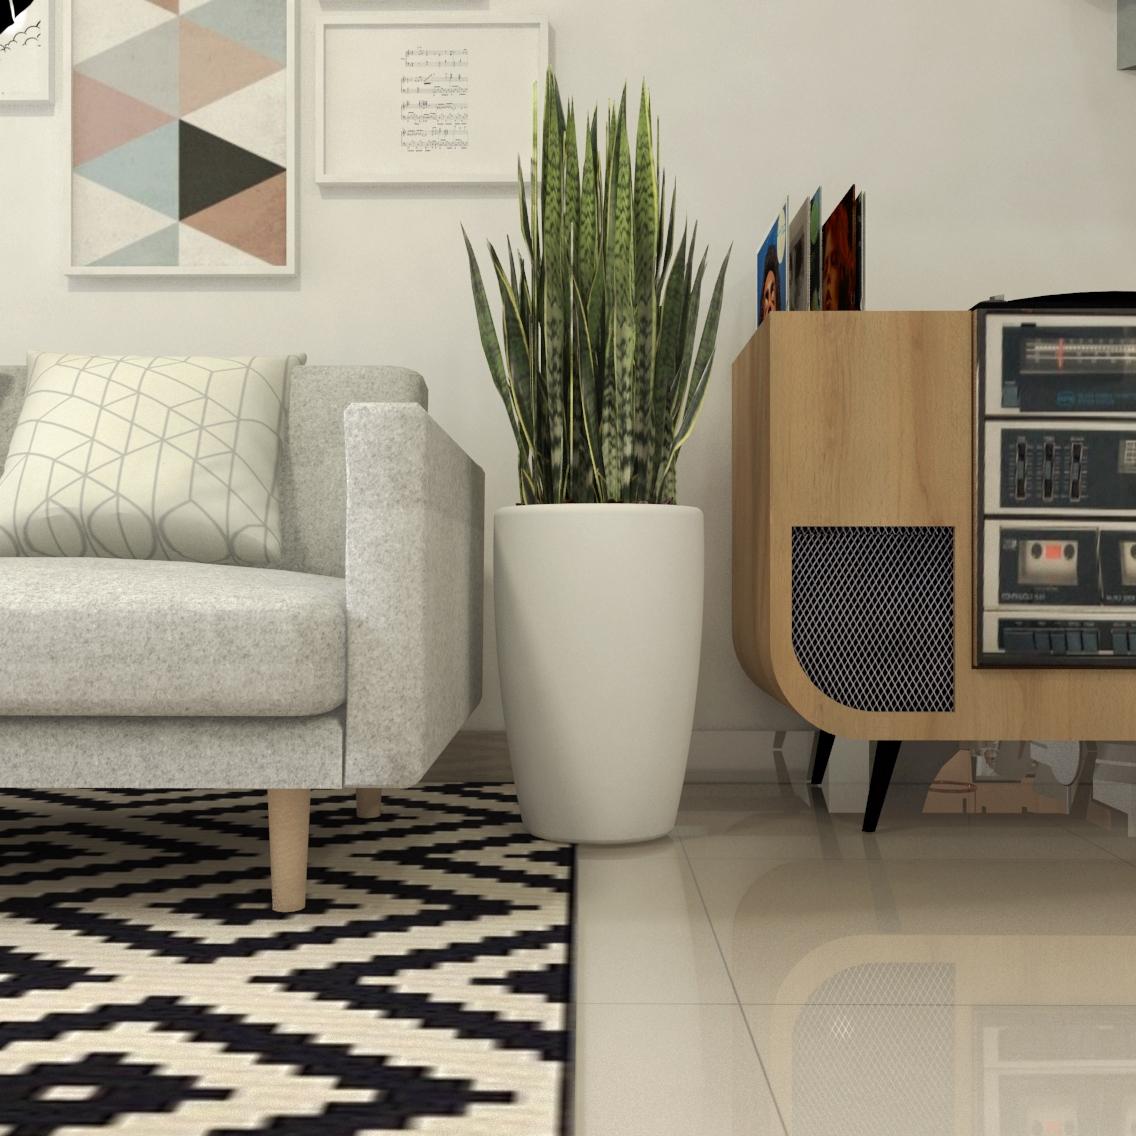 Sala de estar moderna - Projeto por Estúdio Murilo Zadulski Interiores - 02